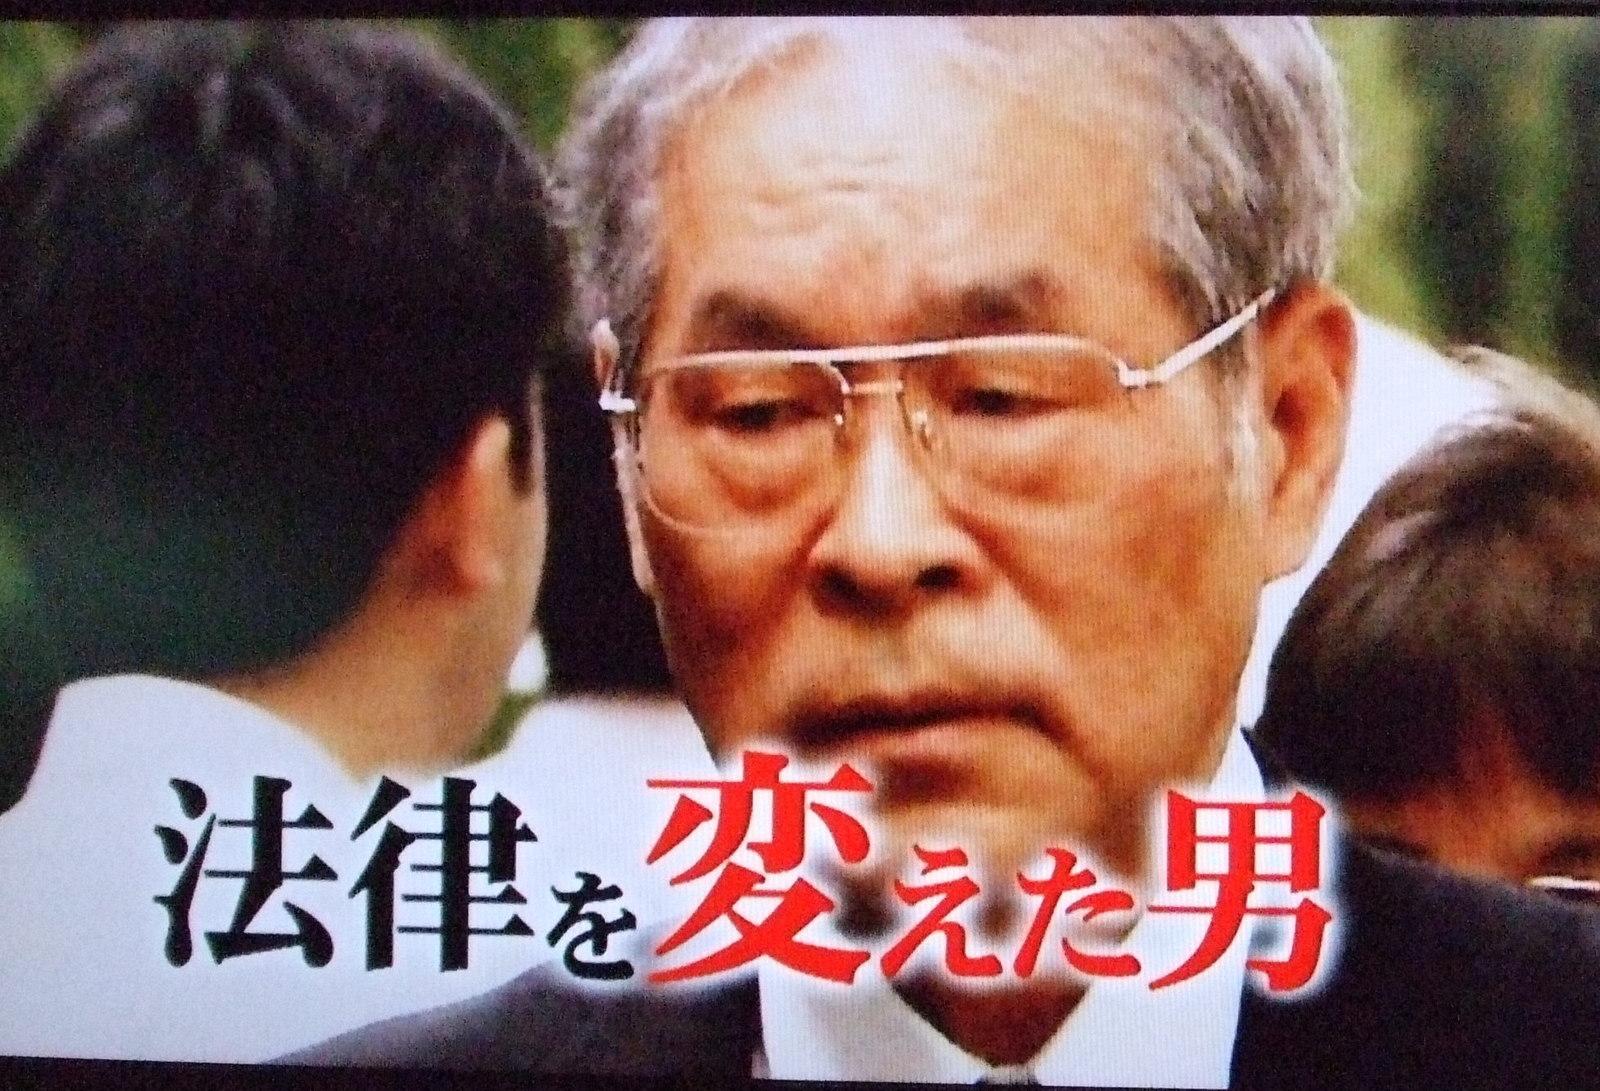 21.12.19) NHK たった一人の反乱...